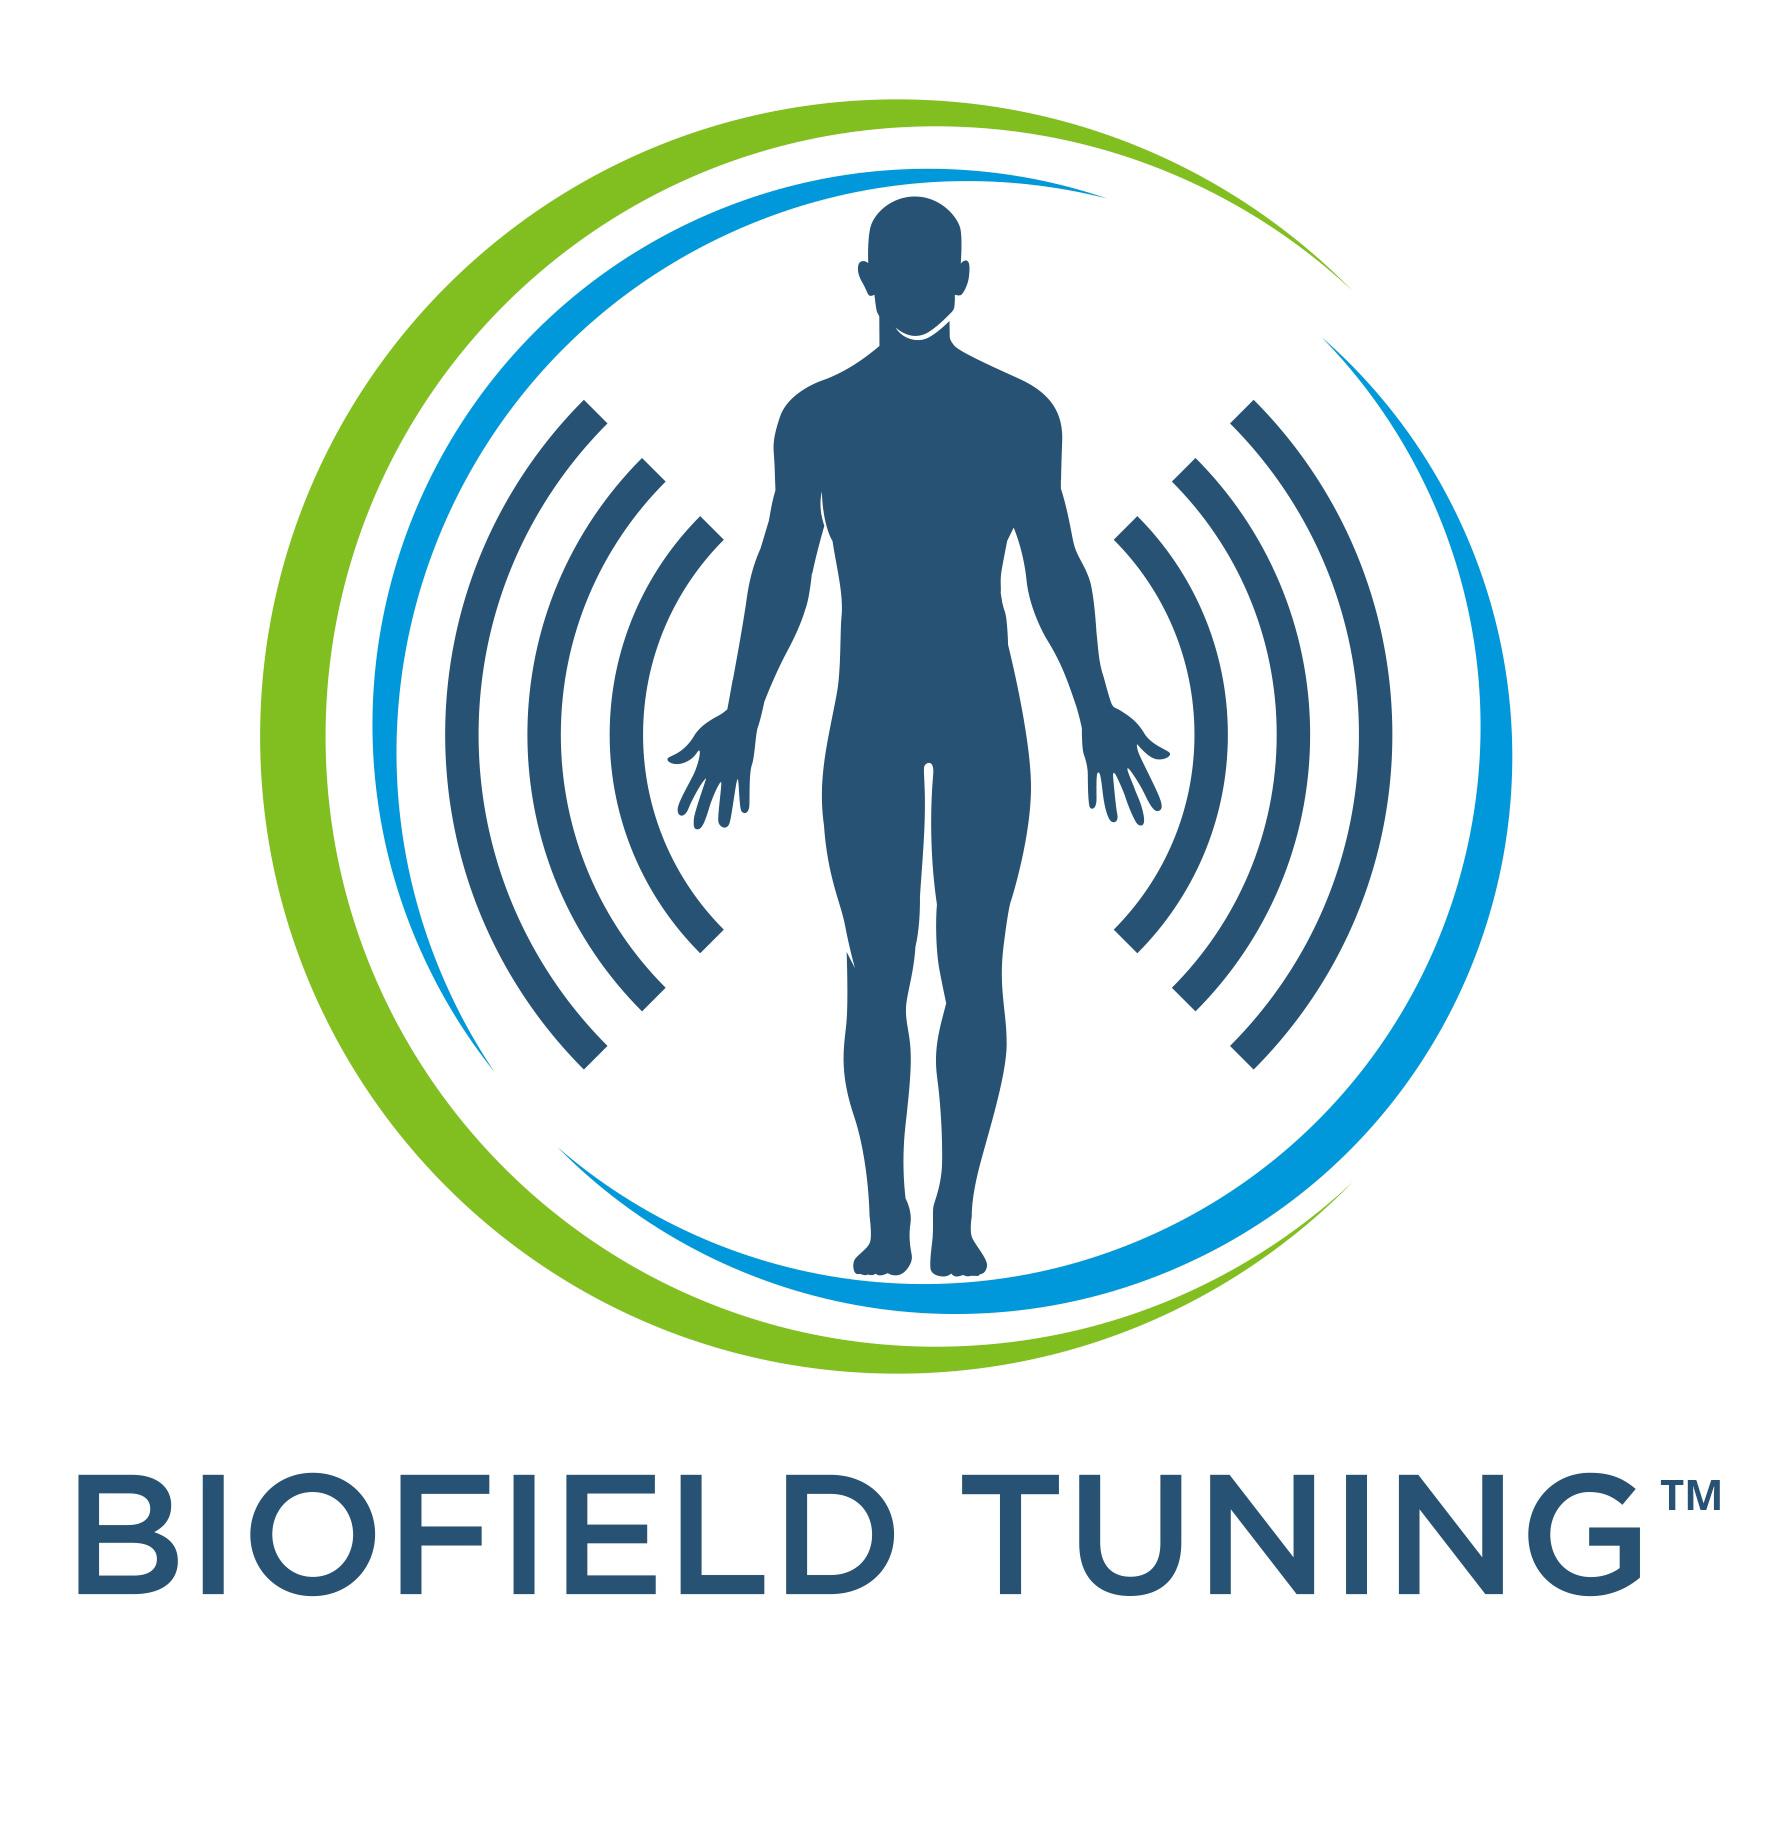 BiofieldTuning - LogoTM (1) copy.JPG